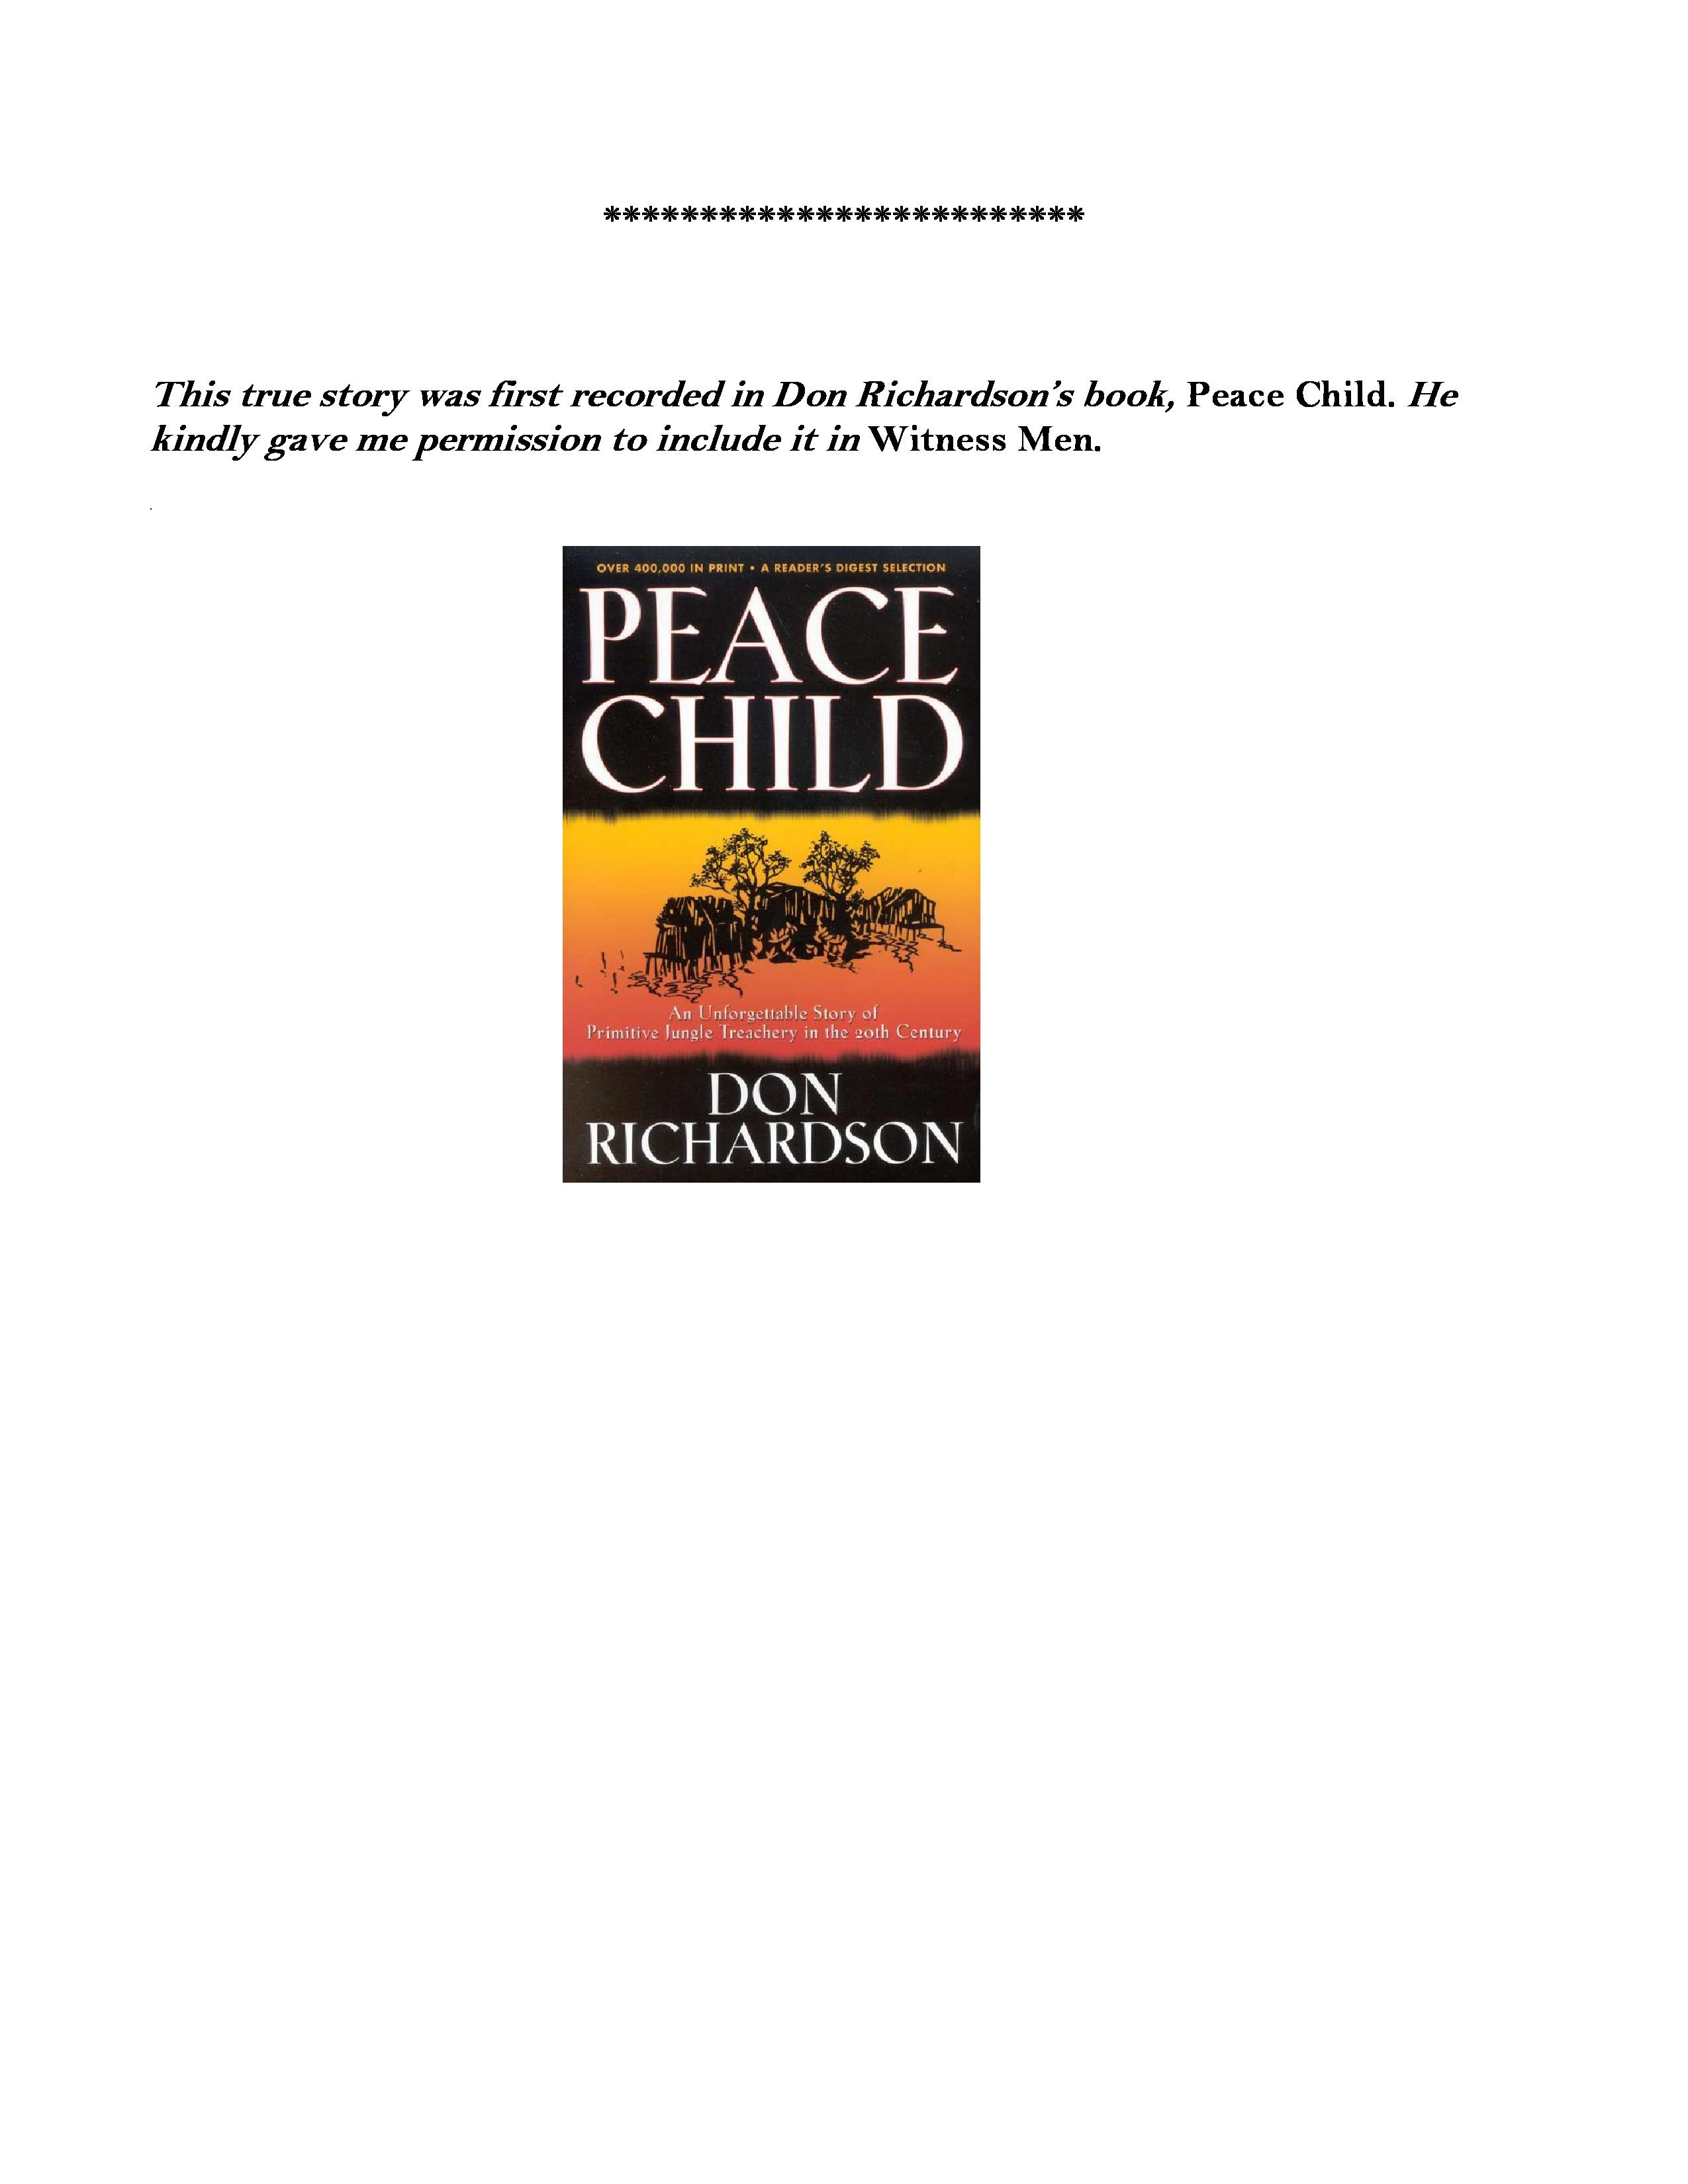 peace child book